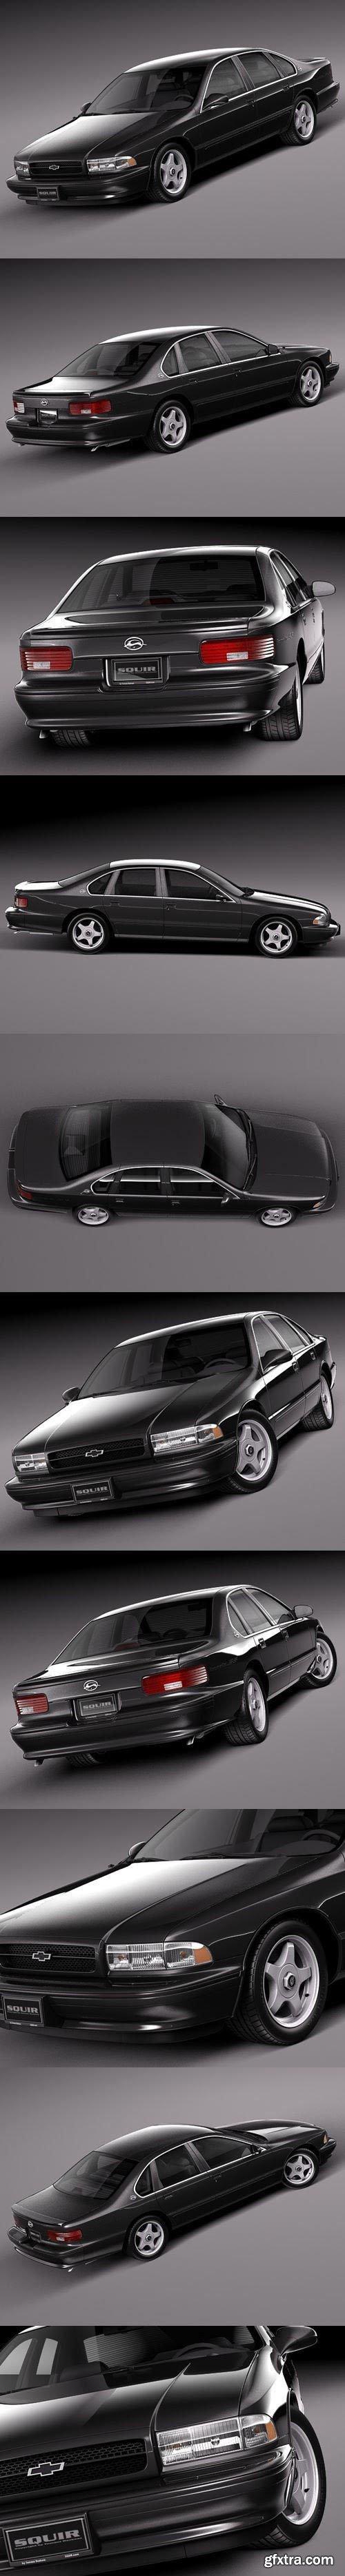 Chevrolet Impala SS 1994-1996 3D Model